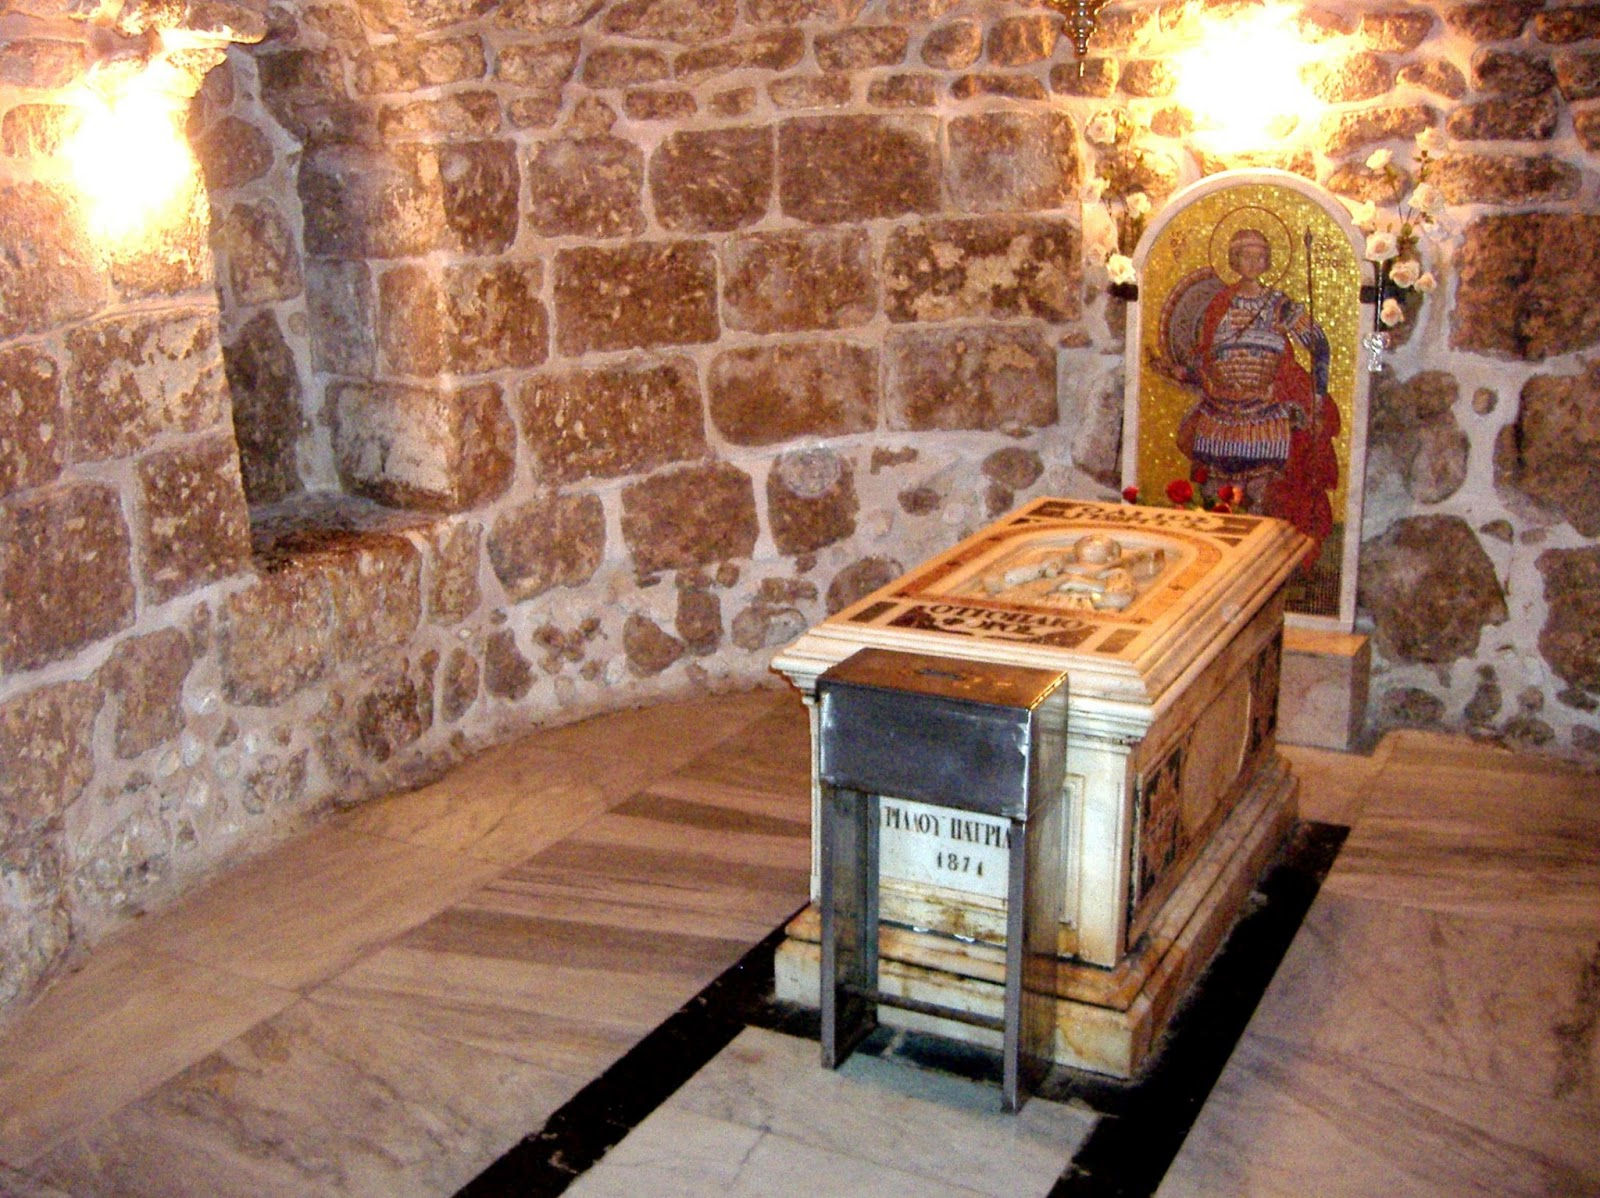 Mormântul si biserica Sfântul Gheorghe, din Lod